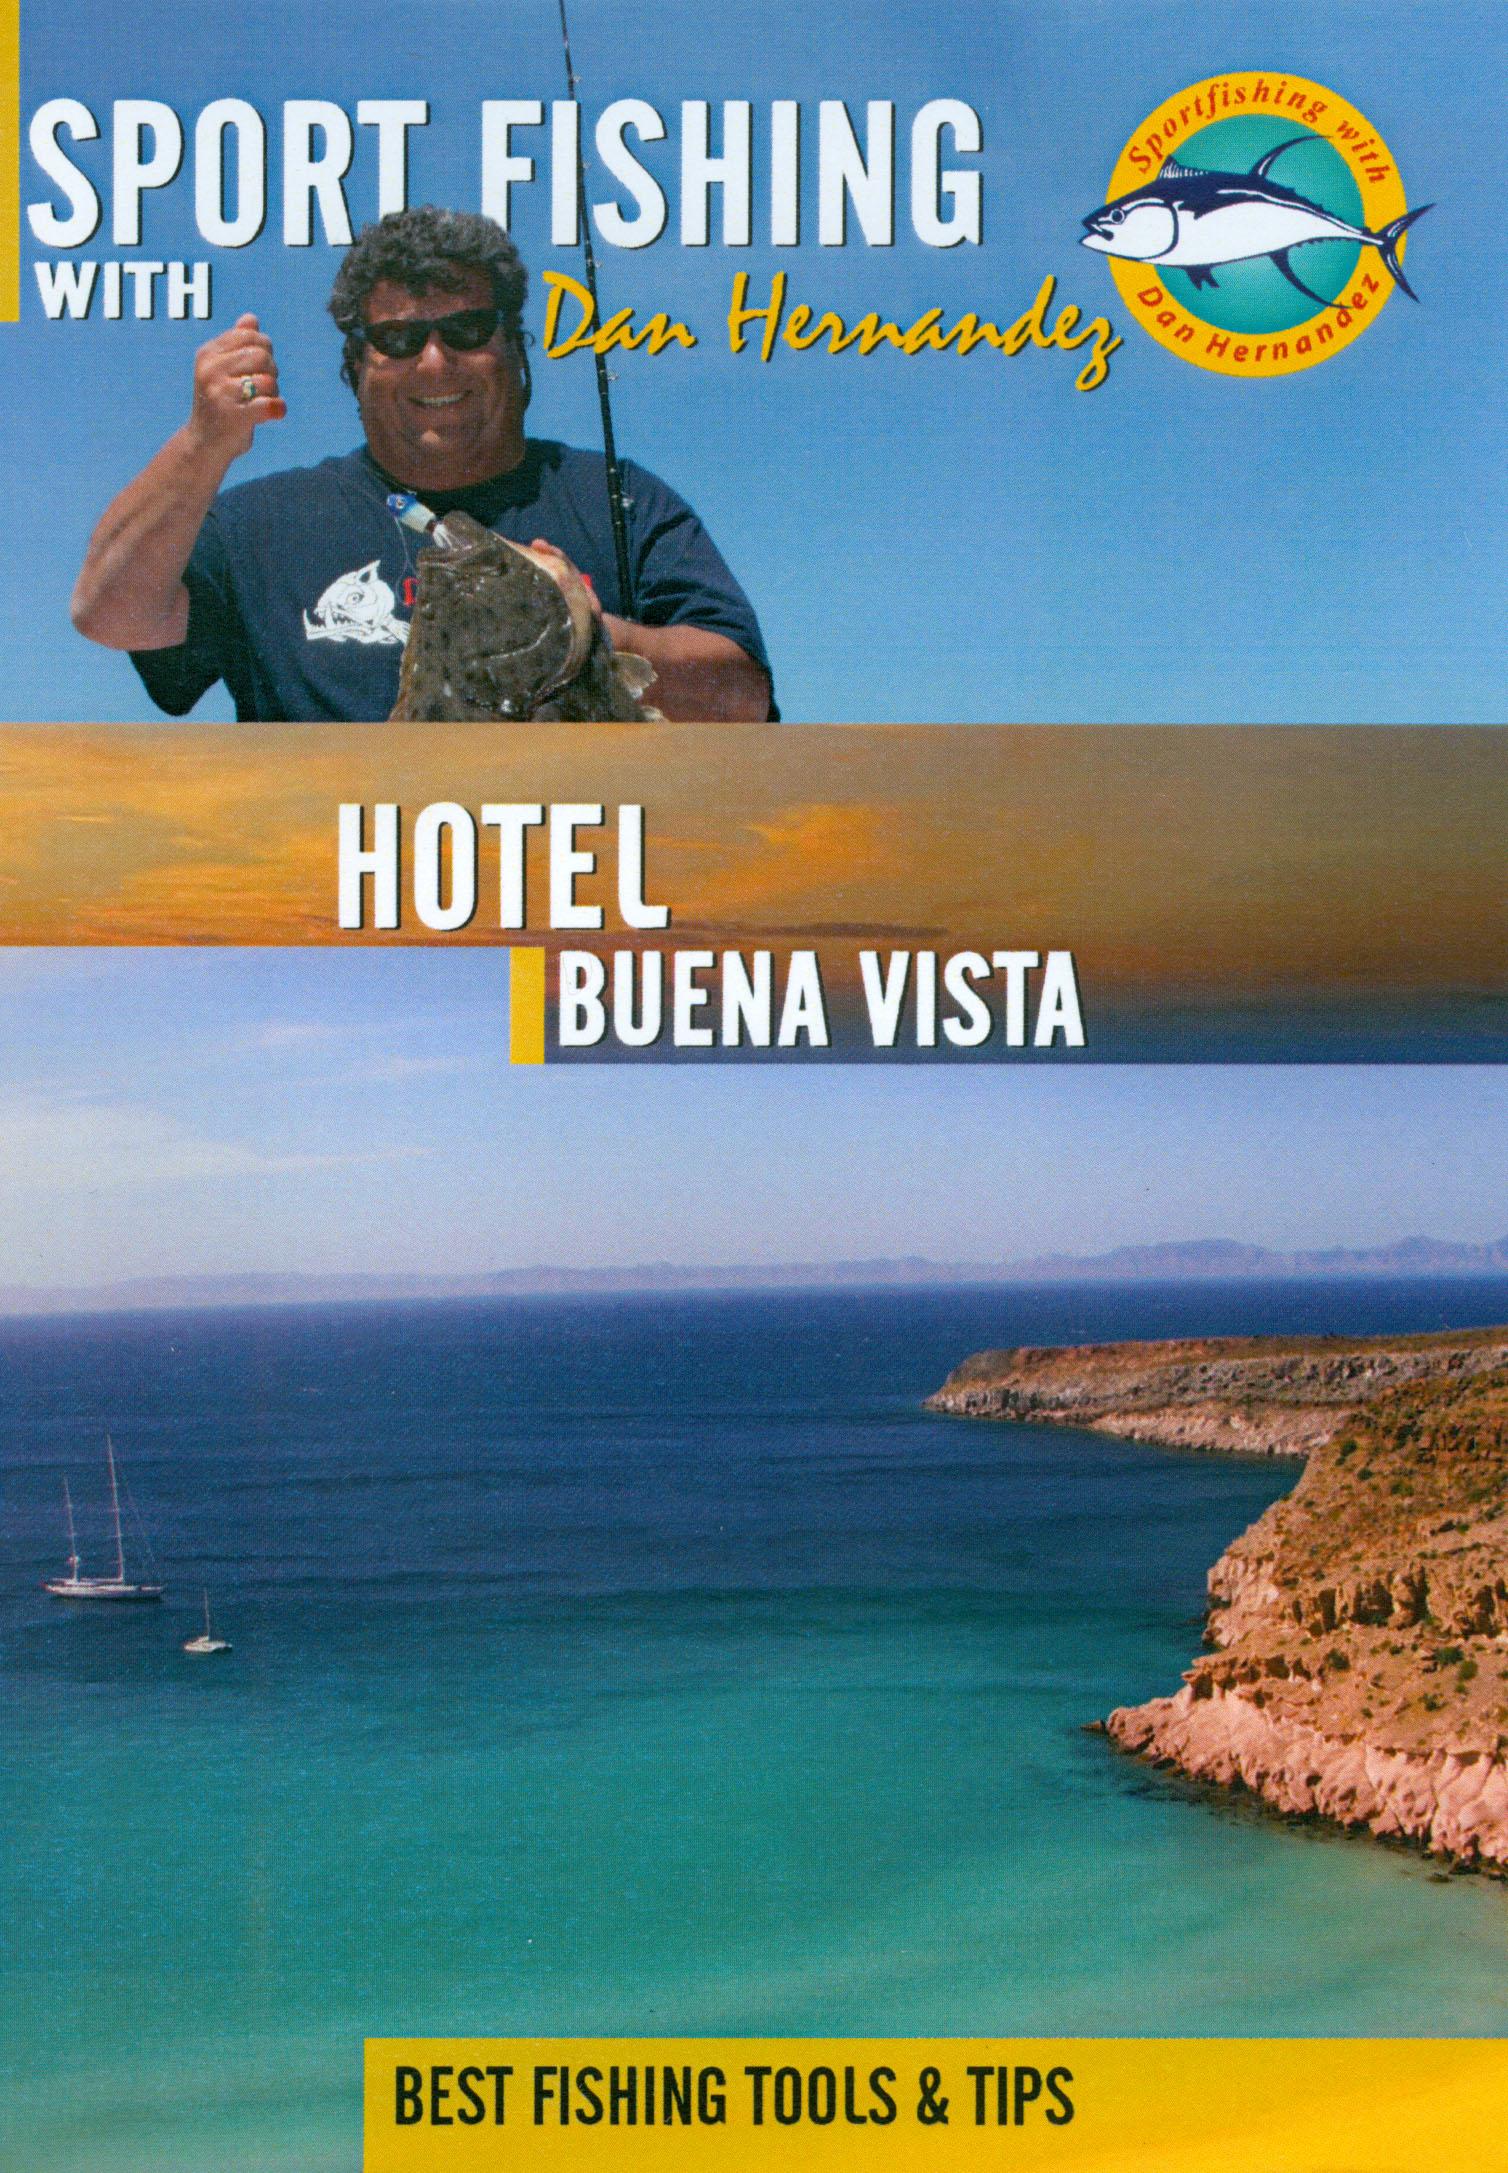 Sport Fishing With Dan Hernandez: Hotel Buena Vista